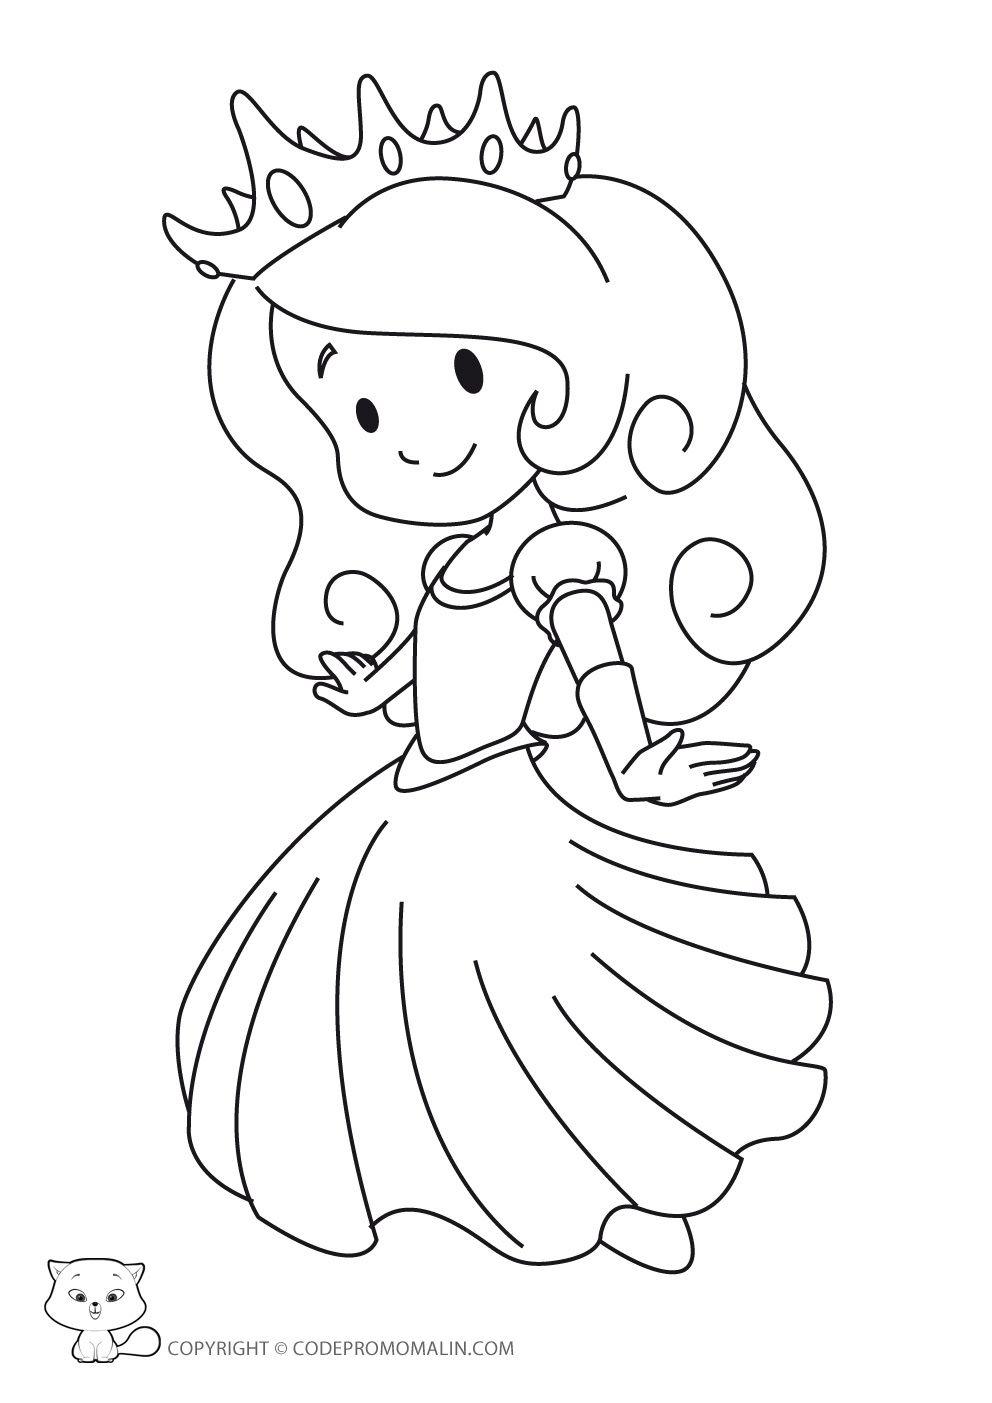 Coloriage Princesse À Colorier - Dessin À Imprimer serapportantà Dessin Animé Princesse Sofia